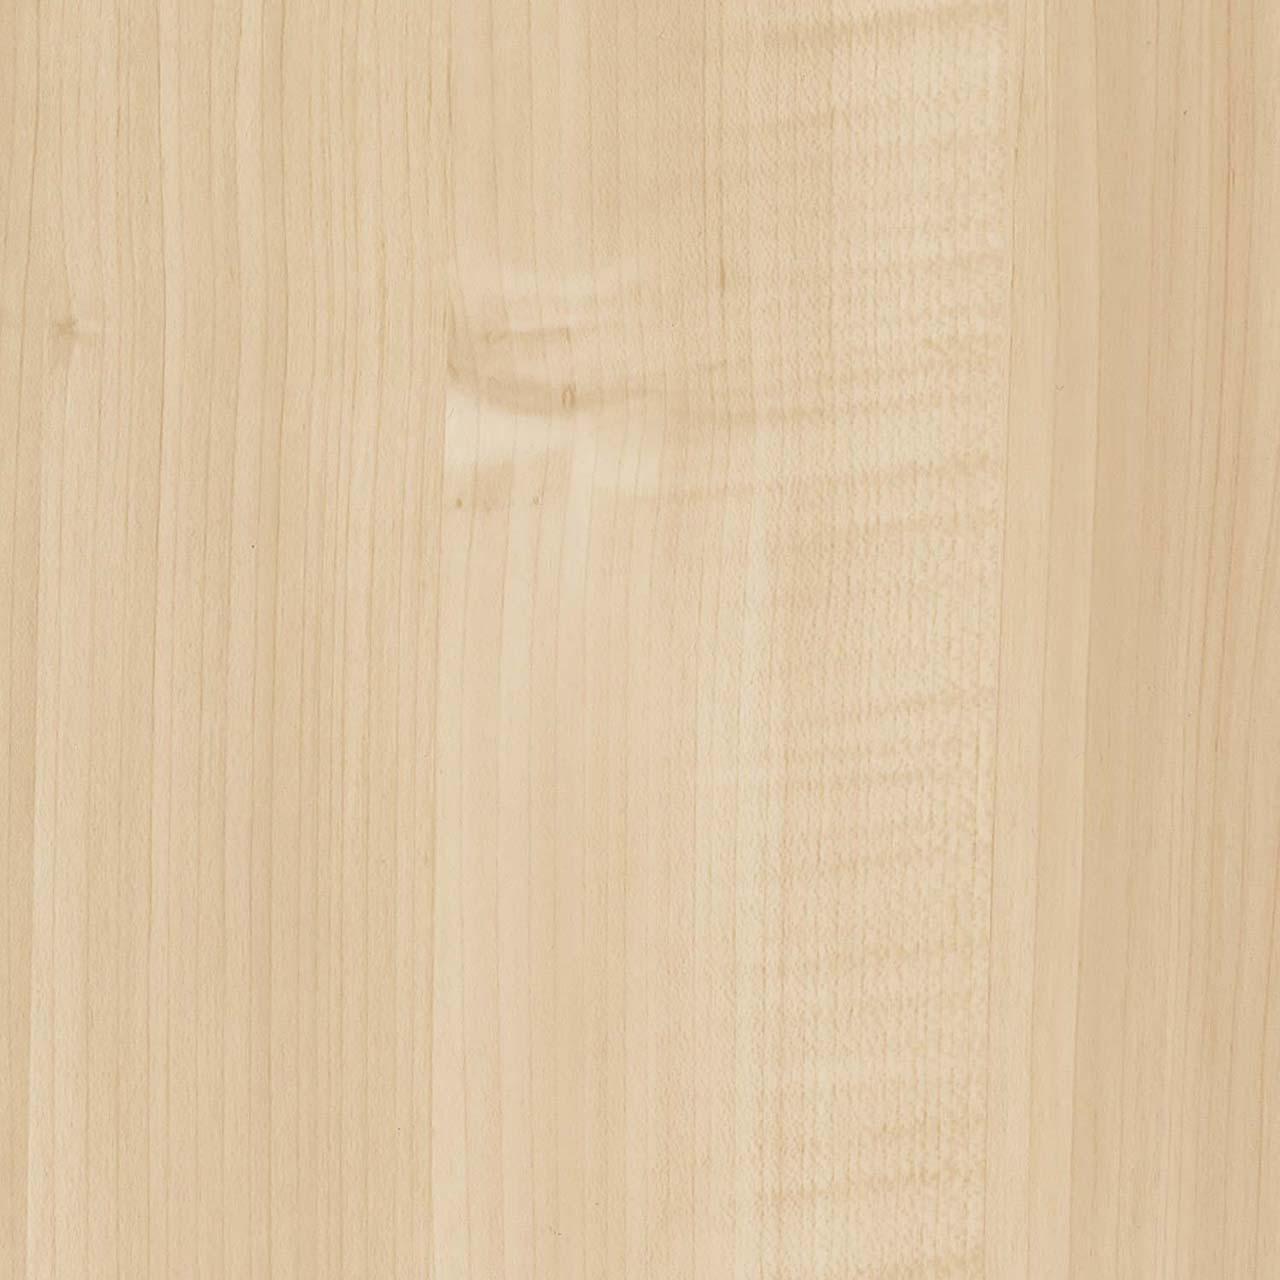 New Maple effect laminate panel